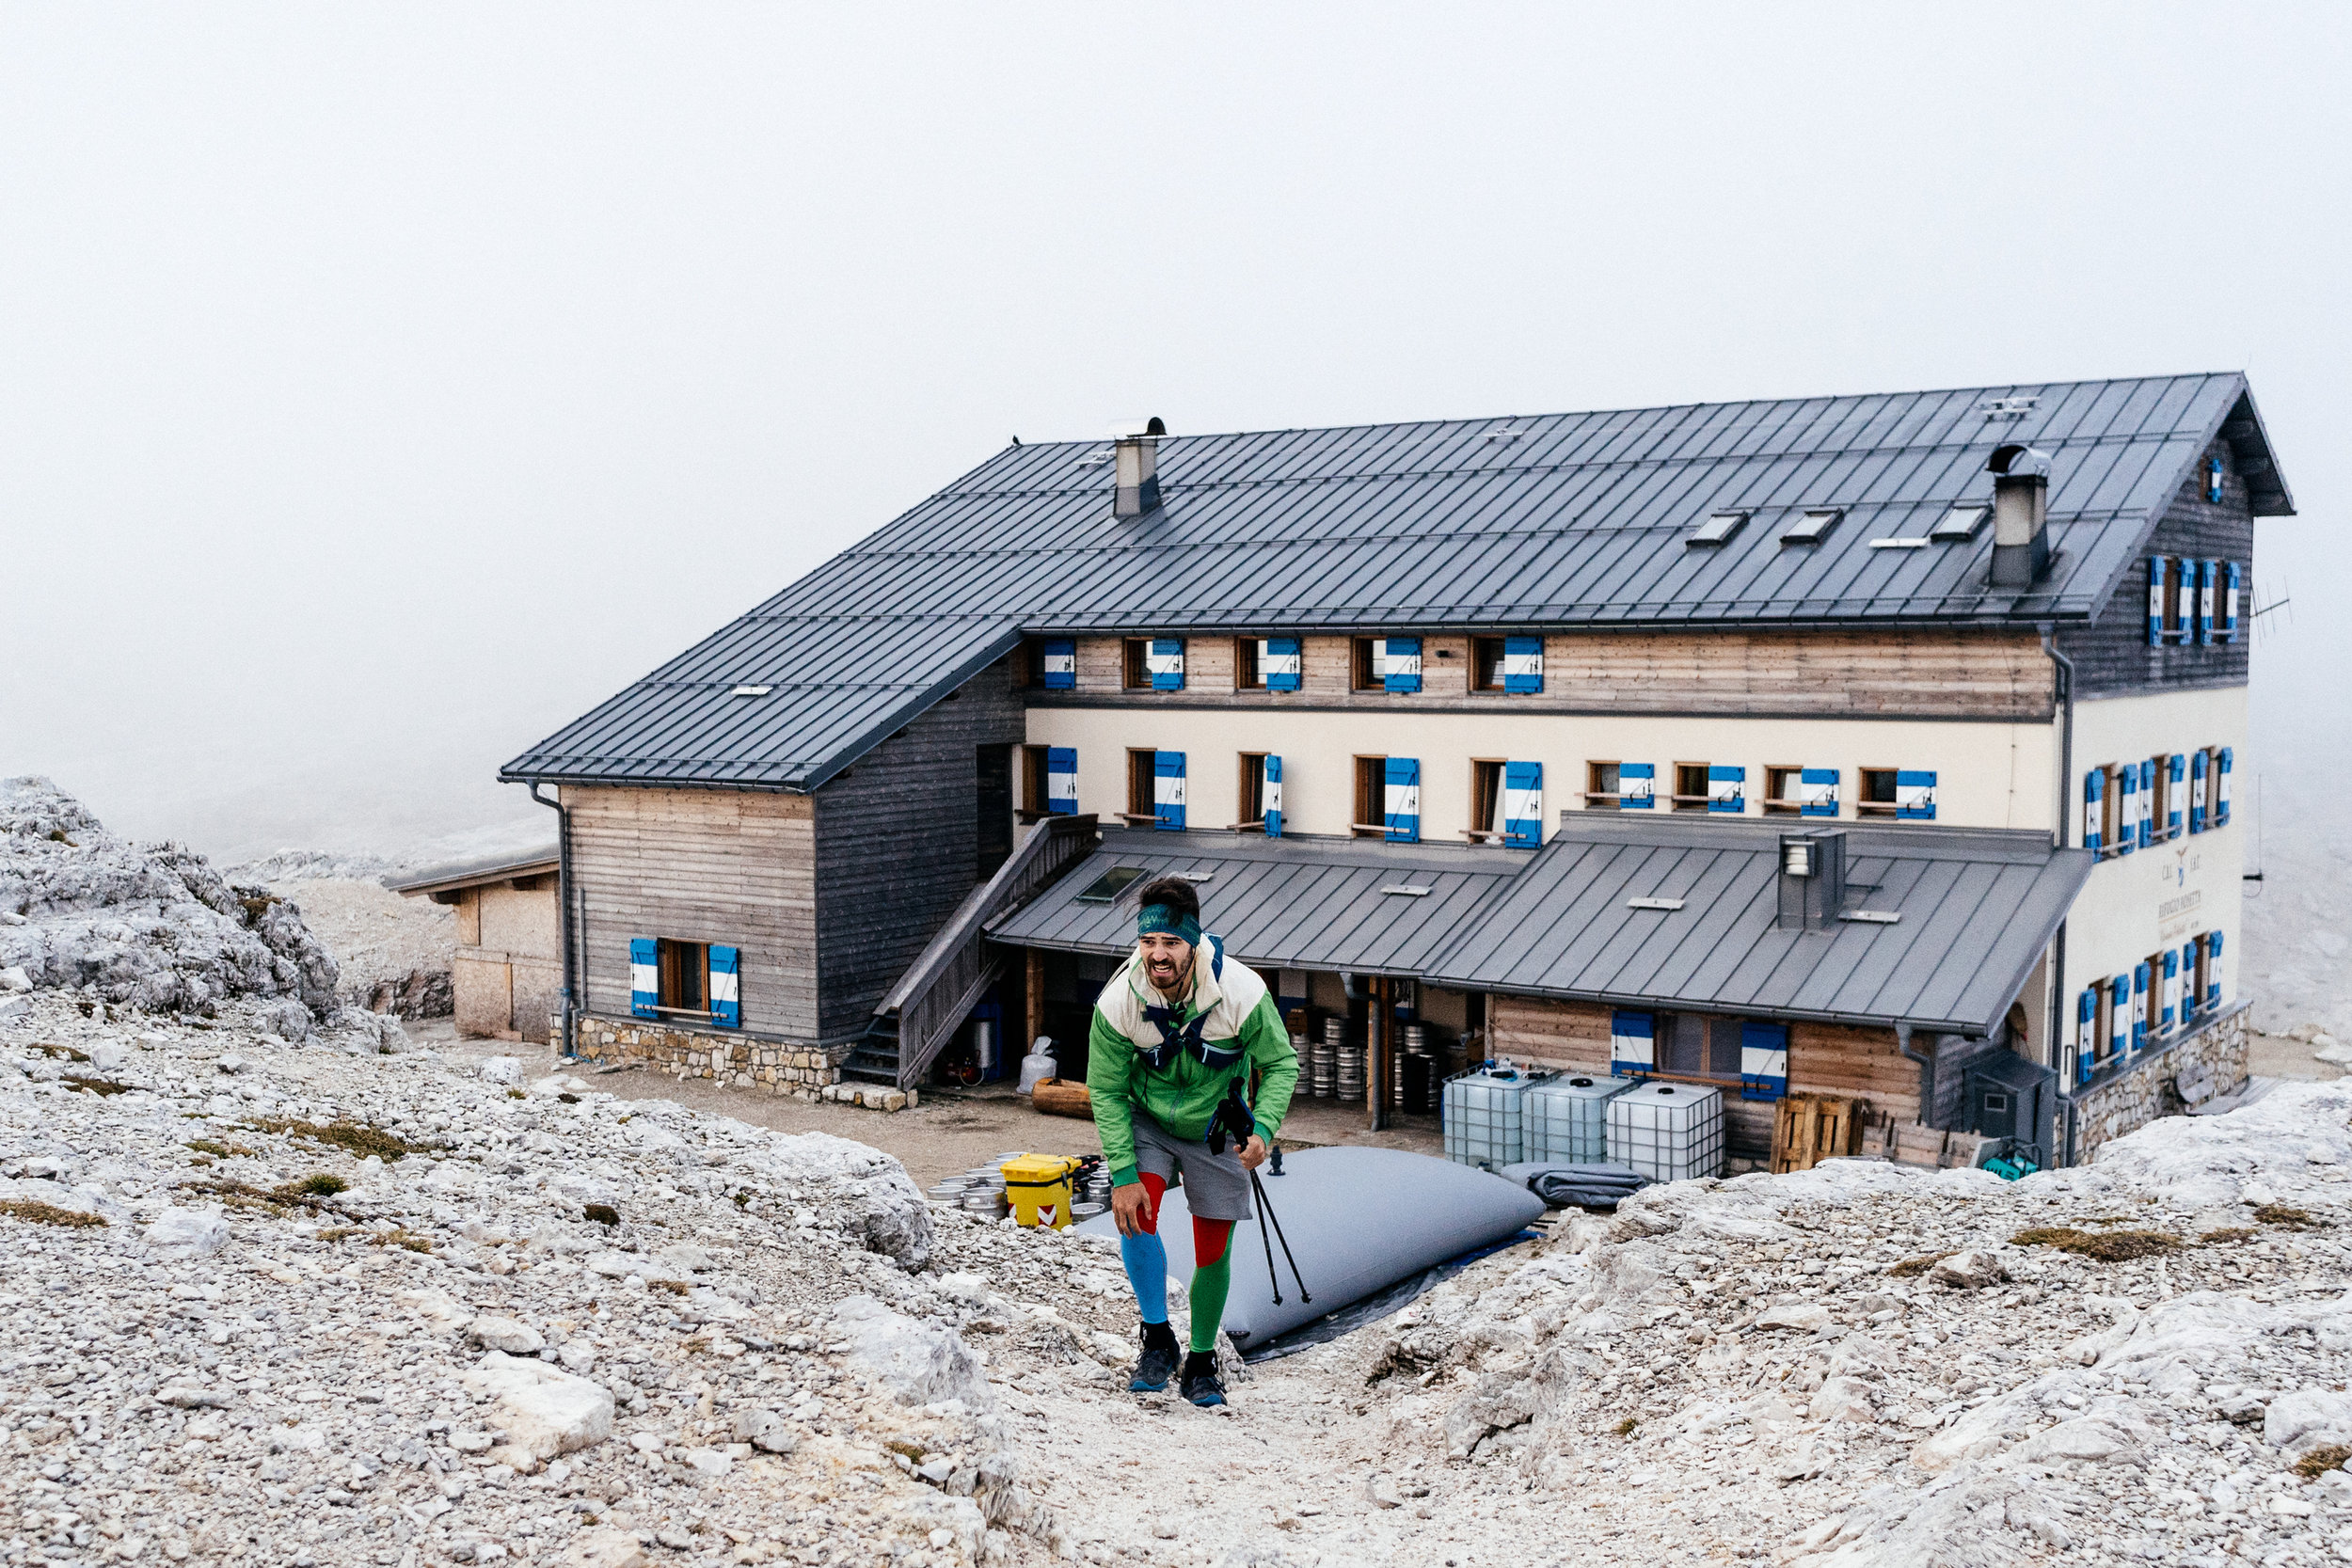 Dolomites-ChrisBrinleeJr-SEP17-63.jpg